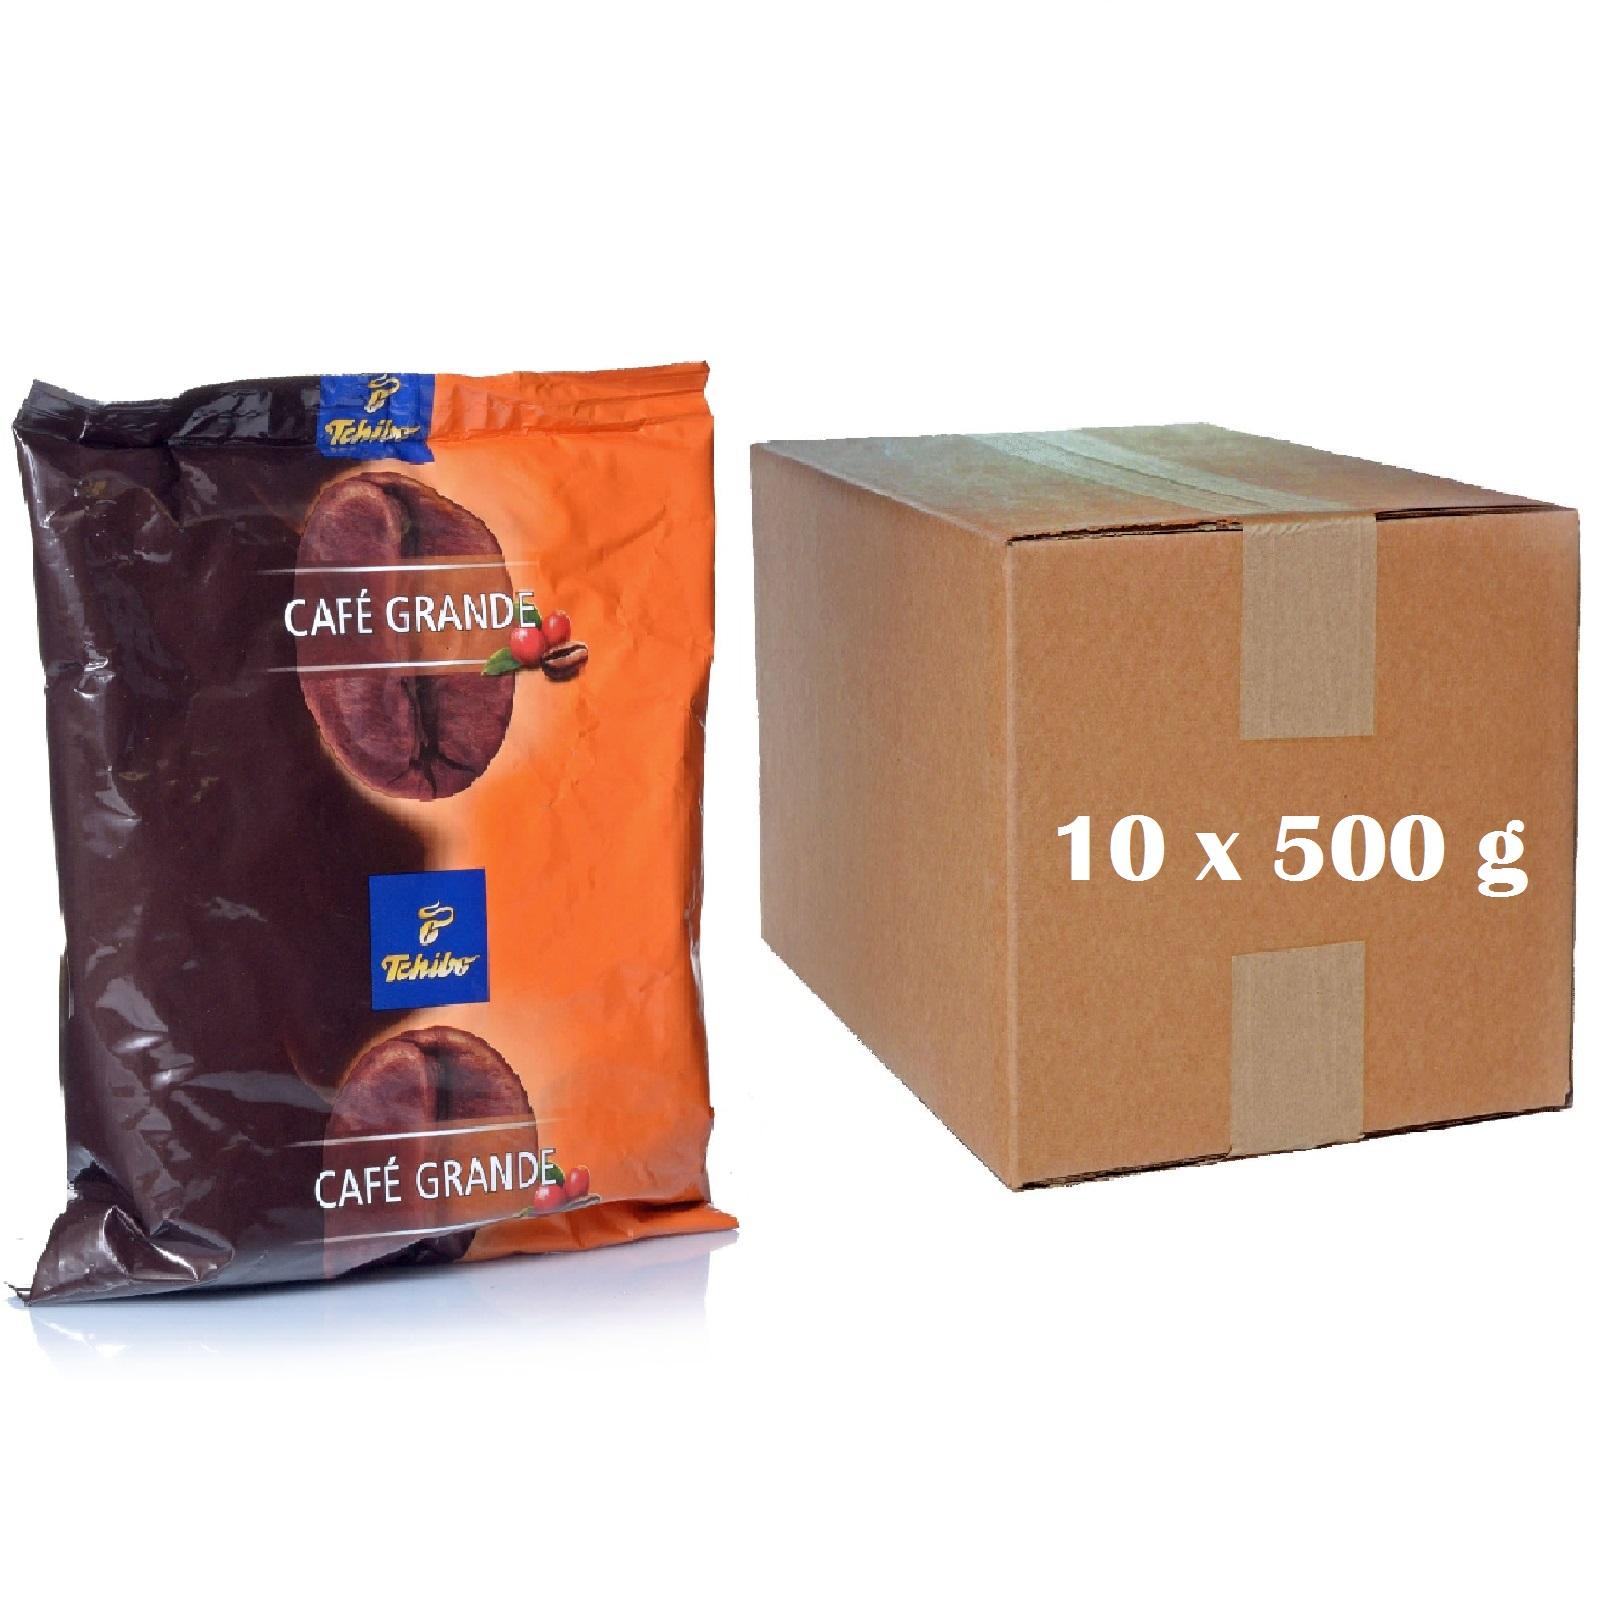 Tchibo Cafe Grande 10 x 500g Kaffee ganze Bohnen